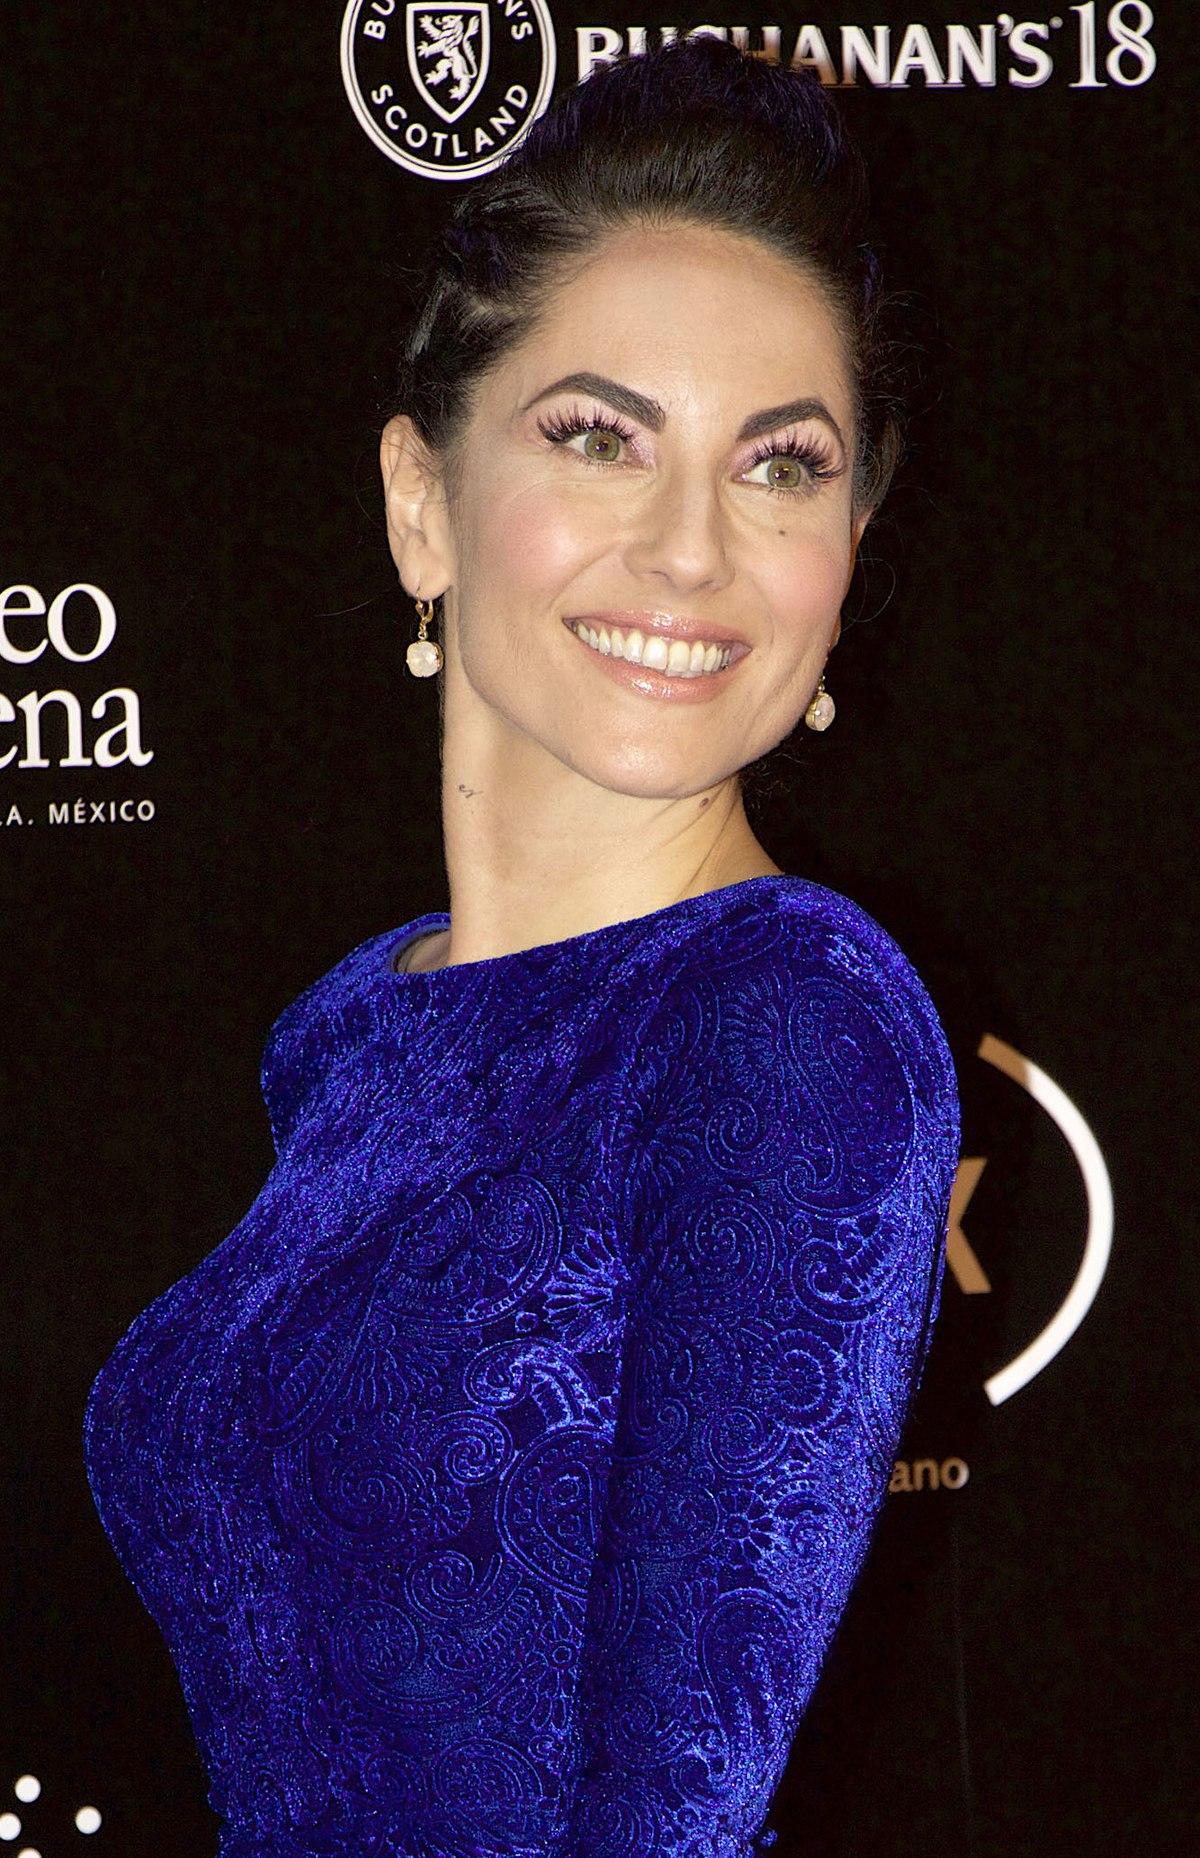 Bárbara Mori - Wikipedia